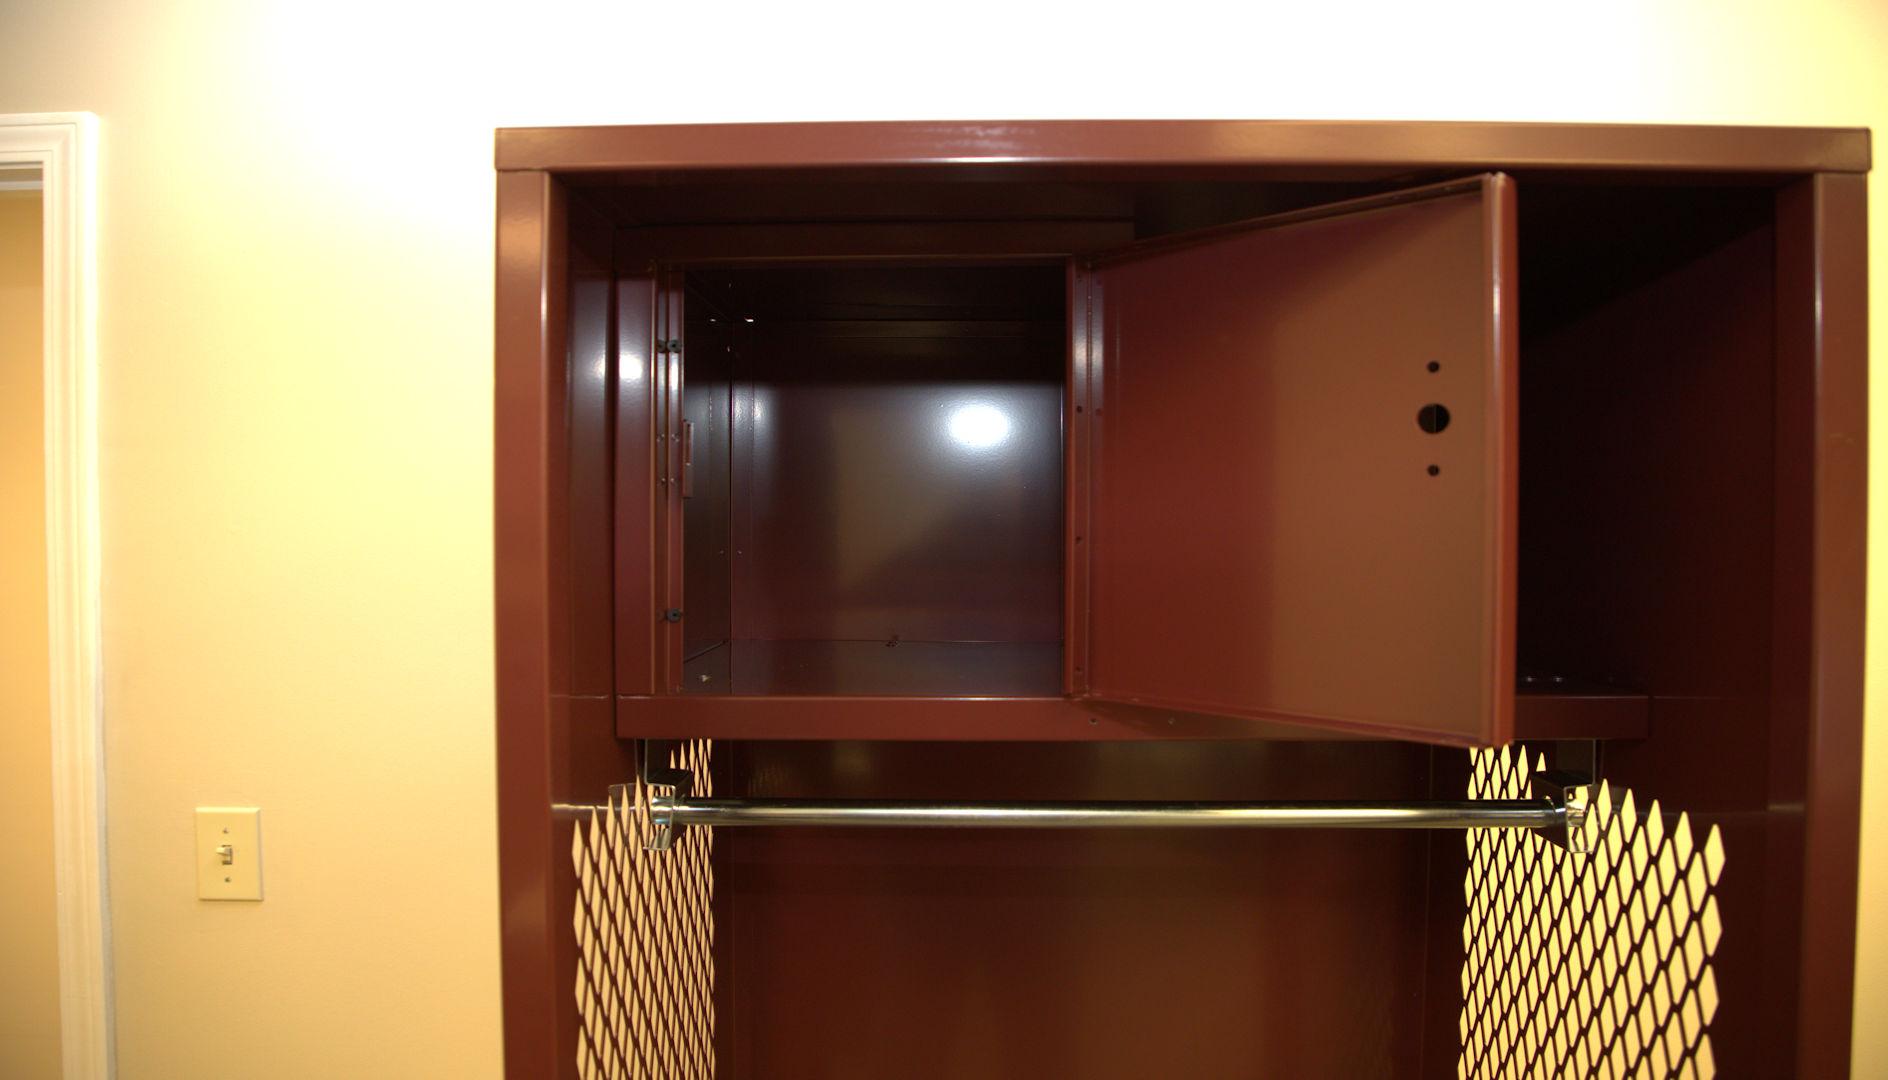 Lockable security box